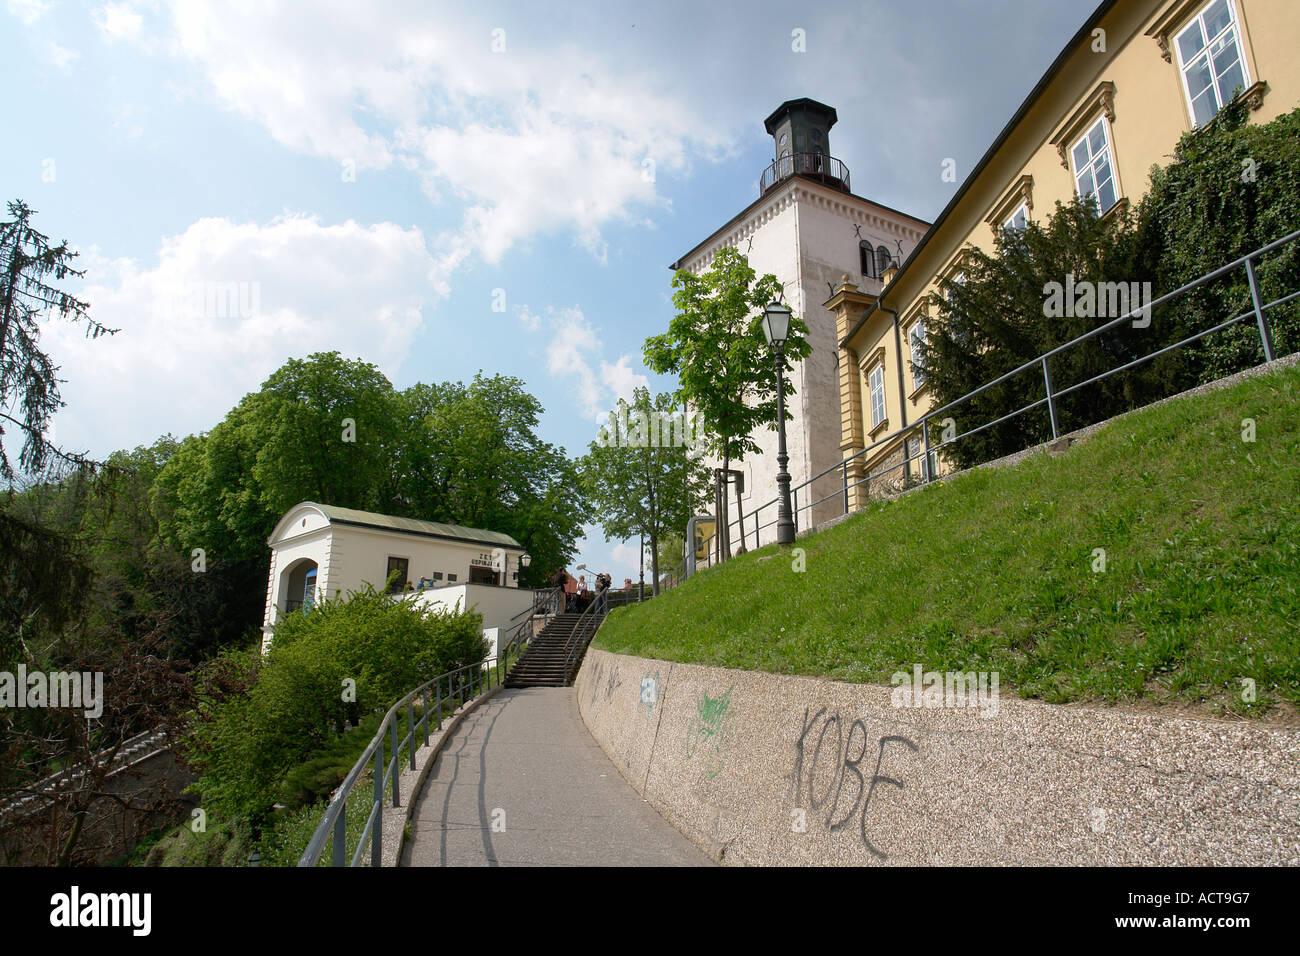 Museum of Naive art Capital hill Zagreb Croatia - Stock Image